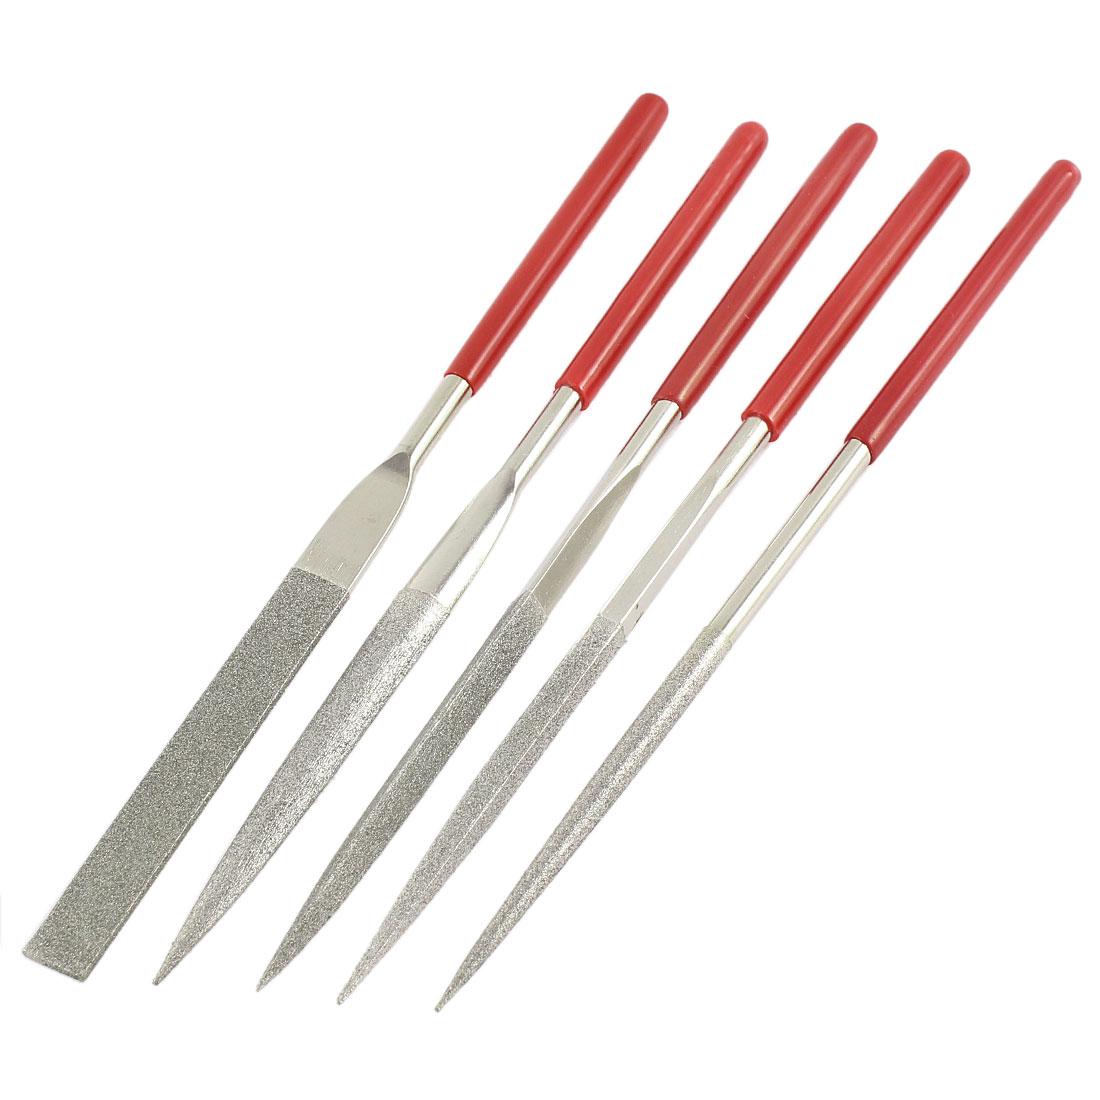 180mm x 5mm Round Flat Triangle Square Oval Diamond Needle File Set 5 Pcs